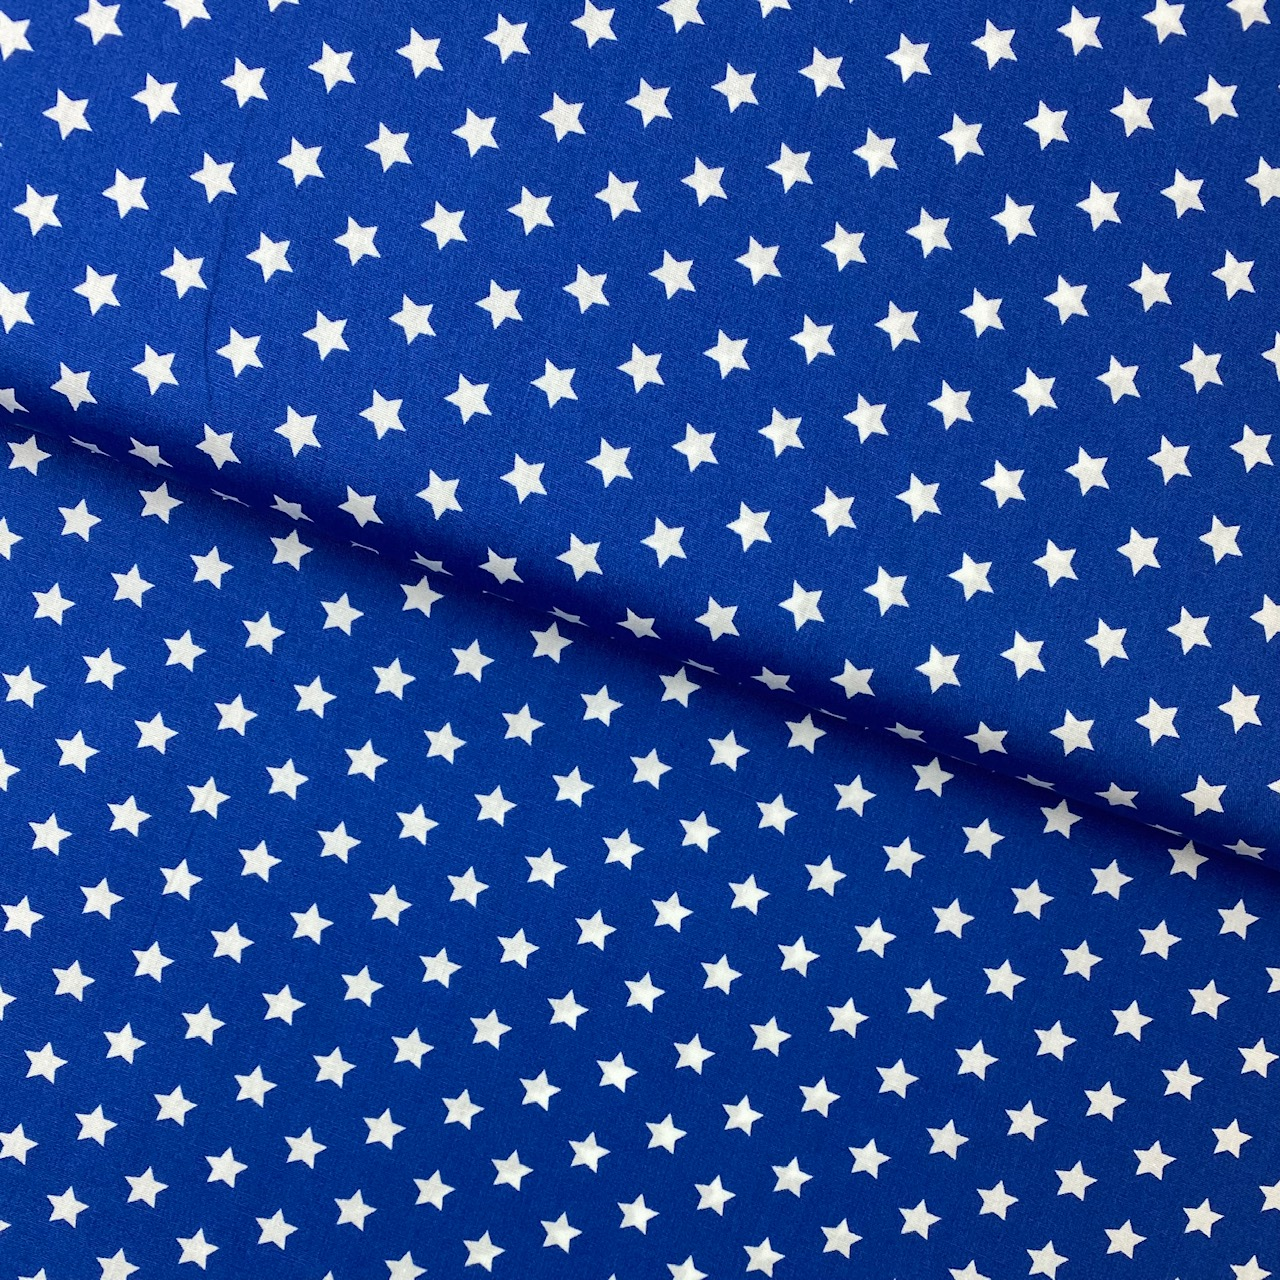 Baumwollpopeline, Sterne, royalblau. Art. SW11379